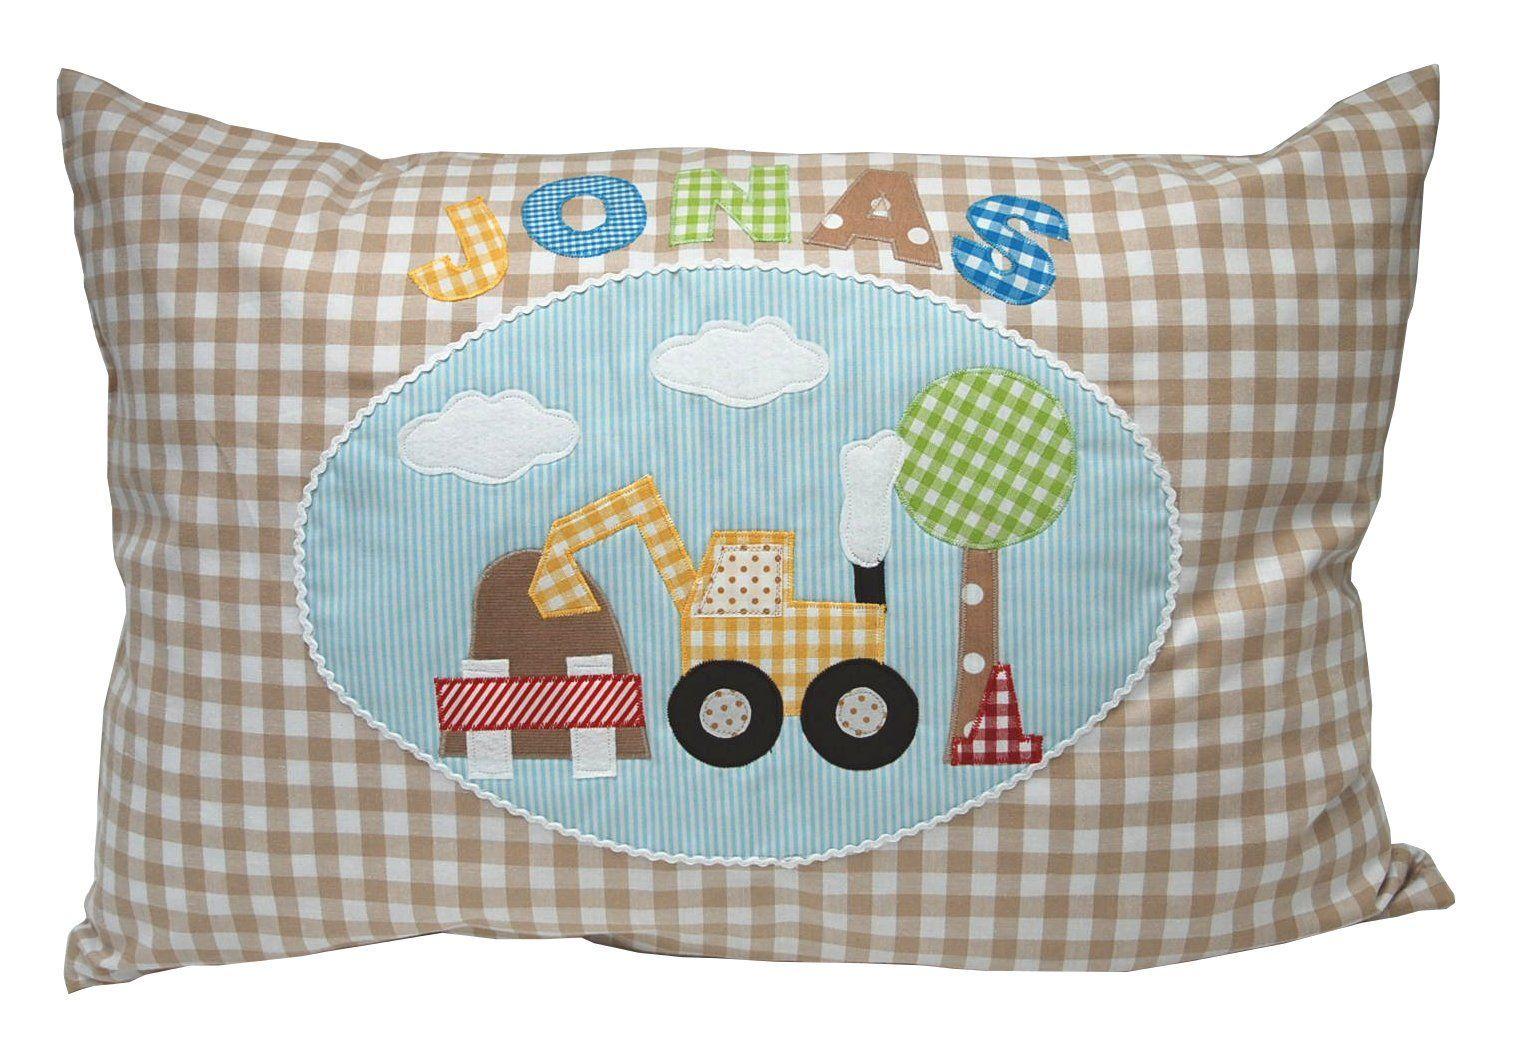 Namenskissen Traktor kleines Kissen mit Name